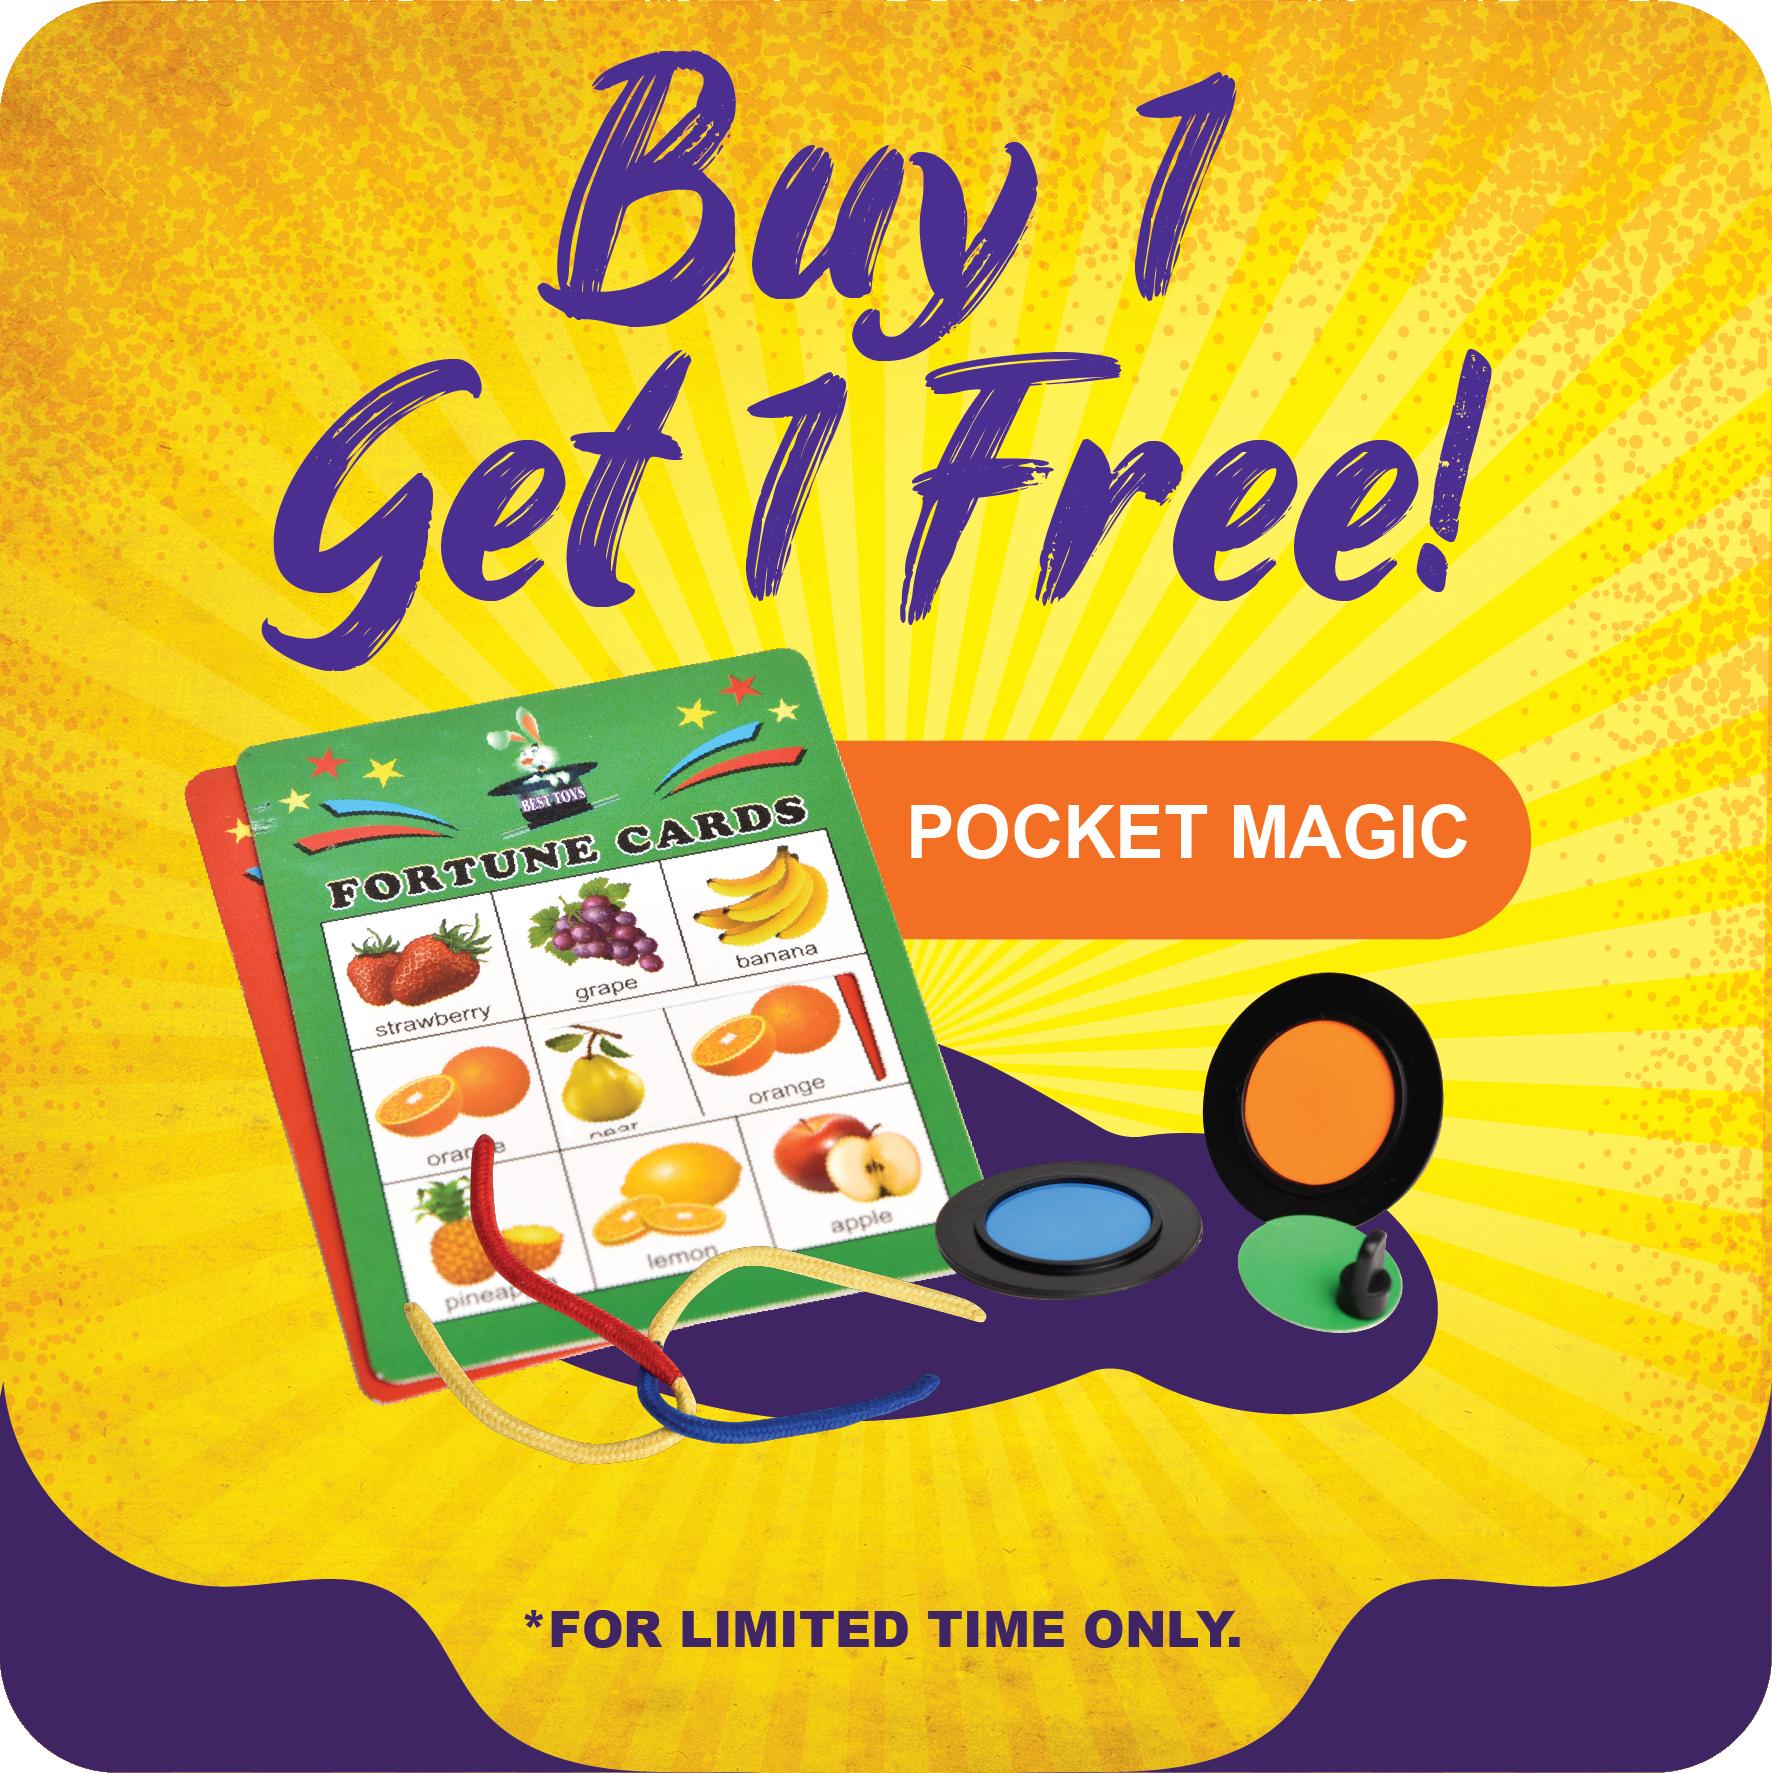 Curiosity Shop June Promotion - Pocket Magic